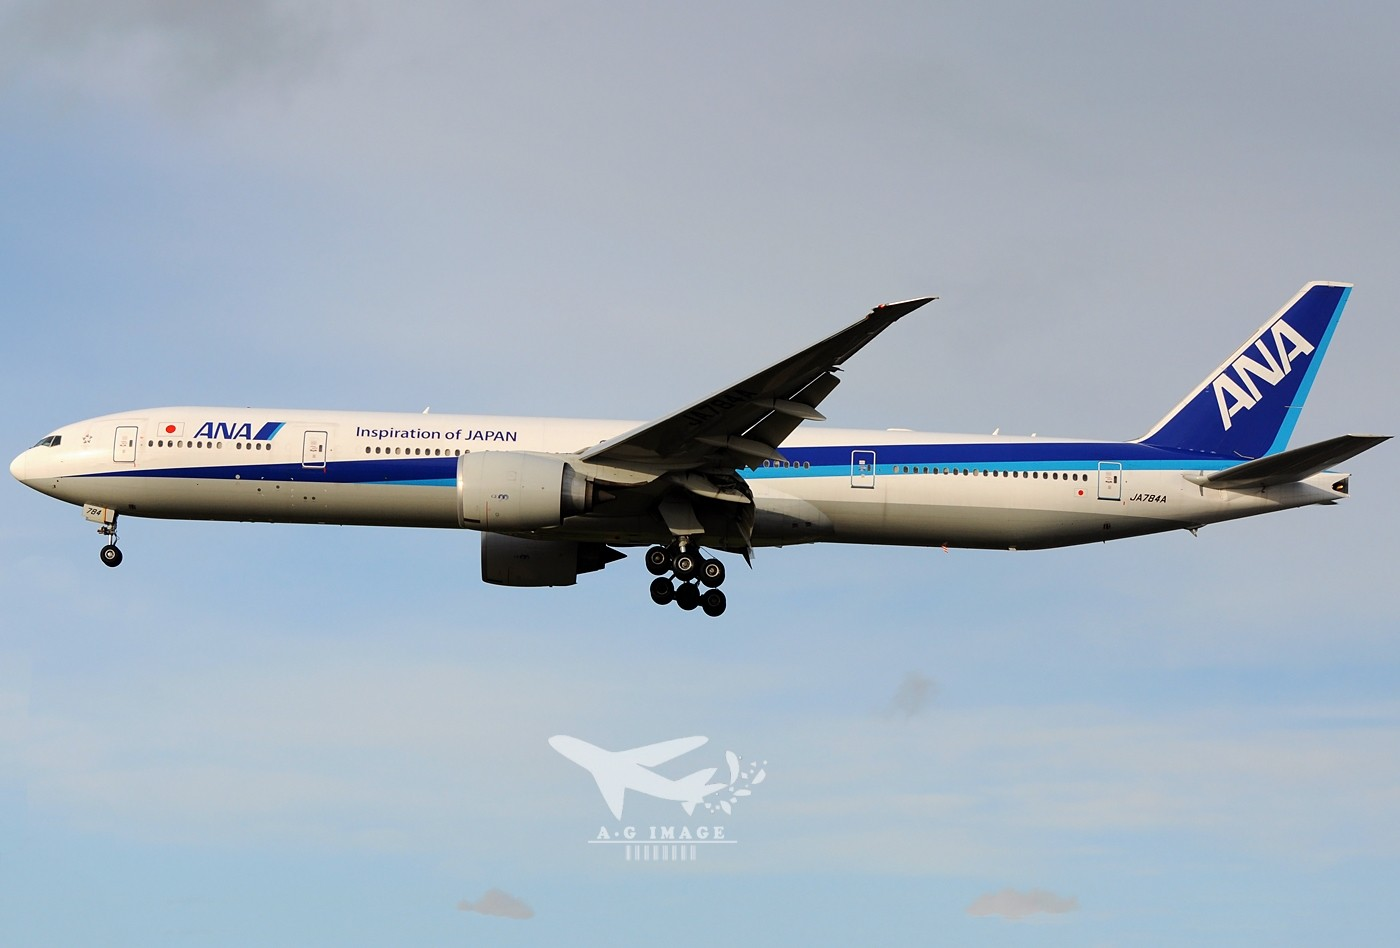 Re:[原创]【七彩天空】--八张来自LHR的77w大图,看到血脉喷张! BOEING 777-300 JA784A 英国伦敦希思罗机场